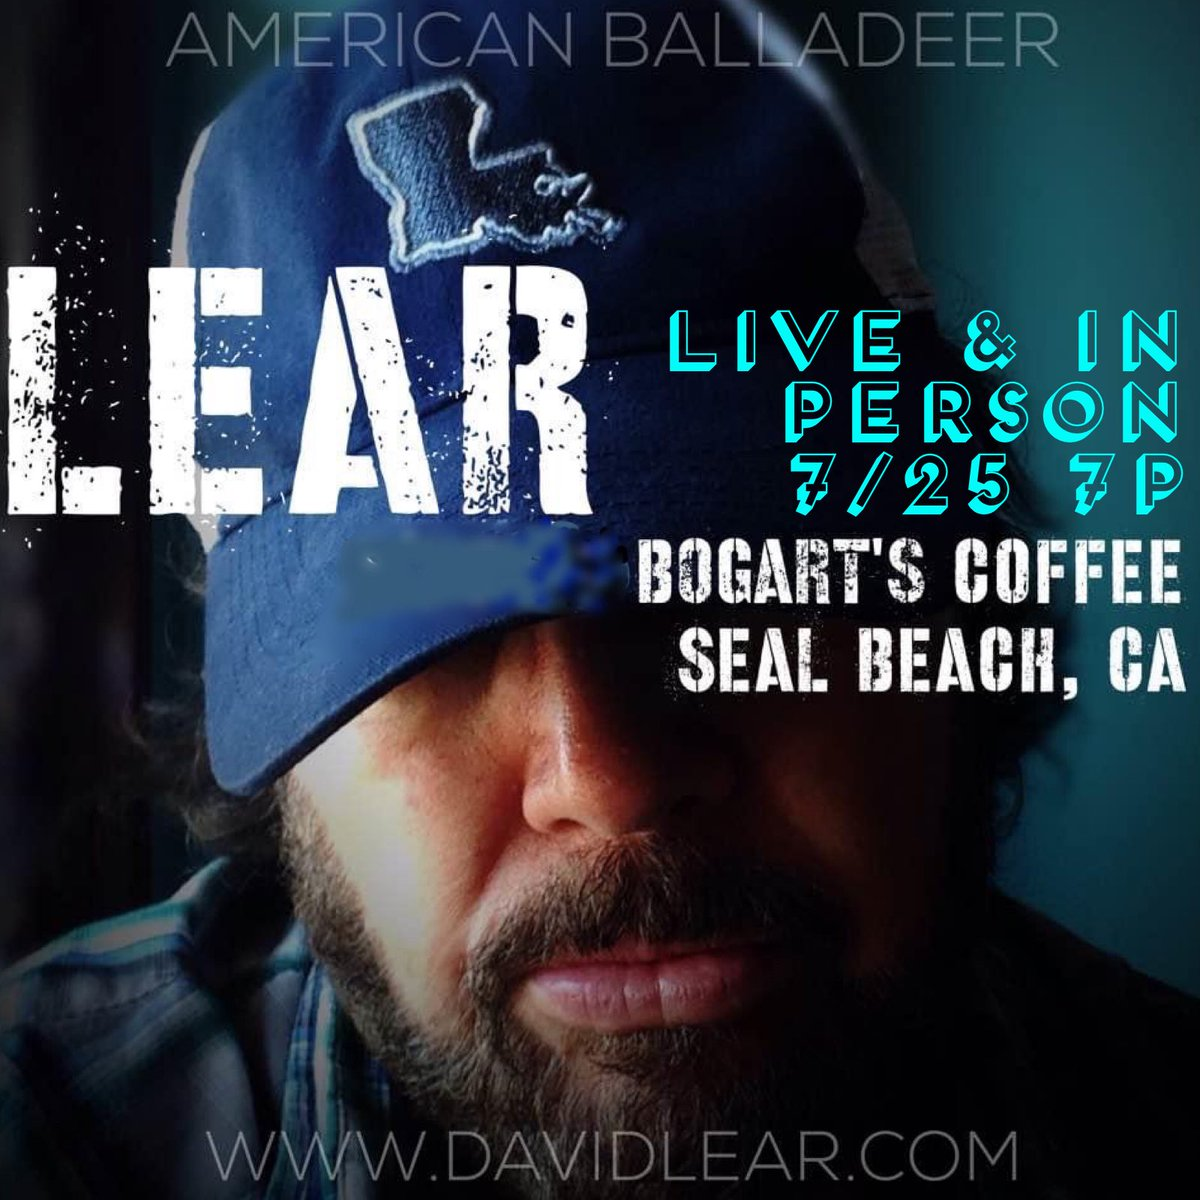 7/25 7p @bogartscoffee playing unplugged set by the #SealBeach pier @ebee55 #americana #country #folk #americanballadeerpic.twitter.com/sYYbRreOJB